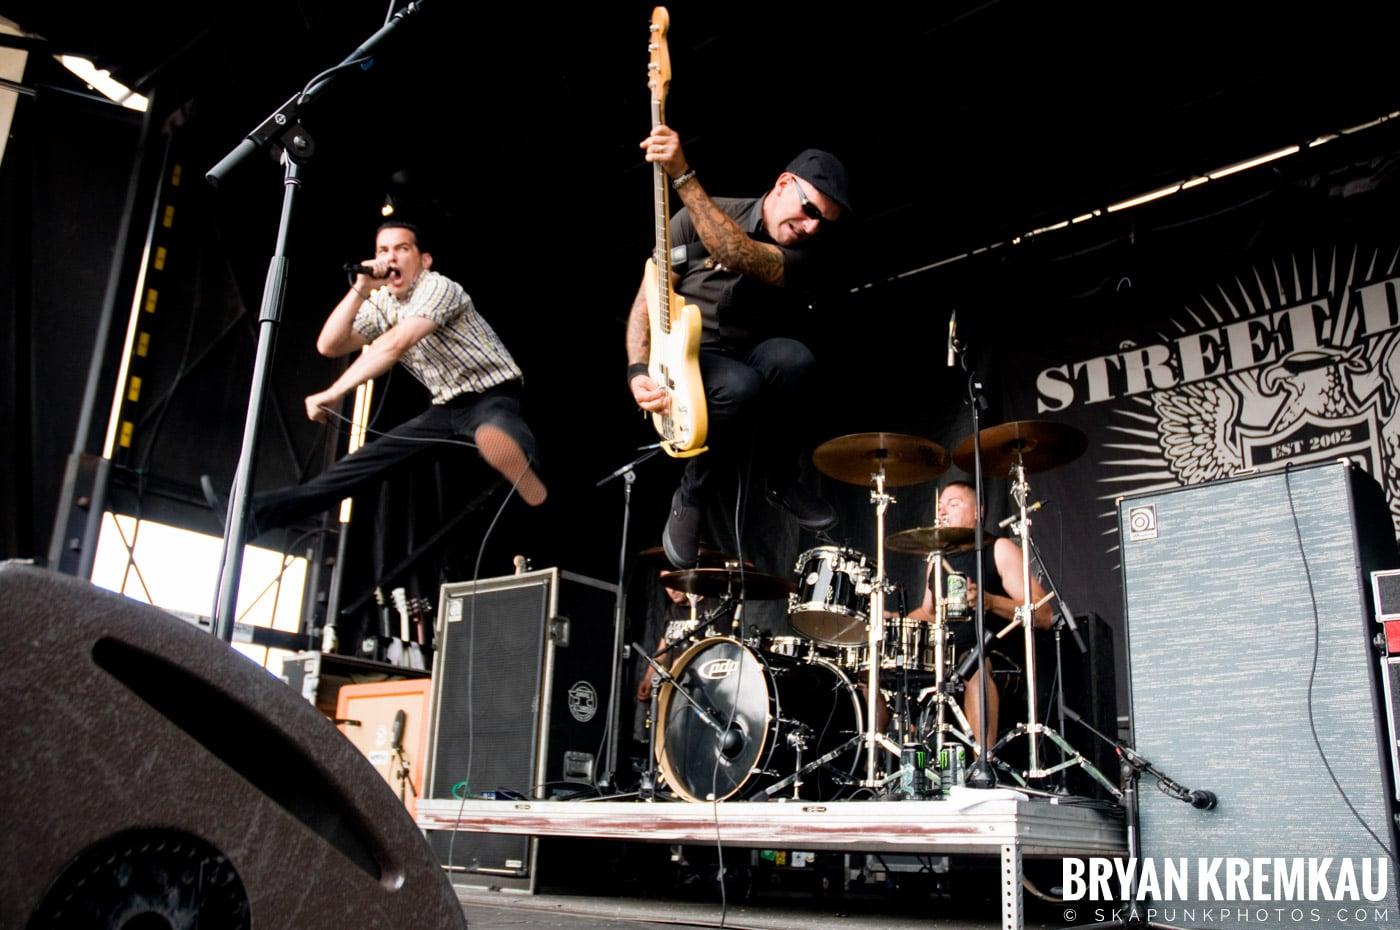 Street Dogs @ Warped Tour, Scranton PA - 7.27.08 (12)